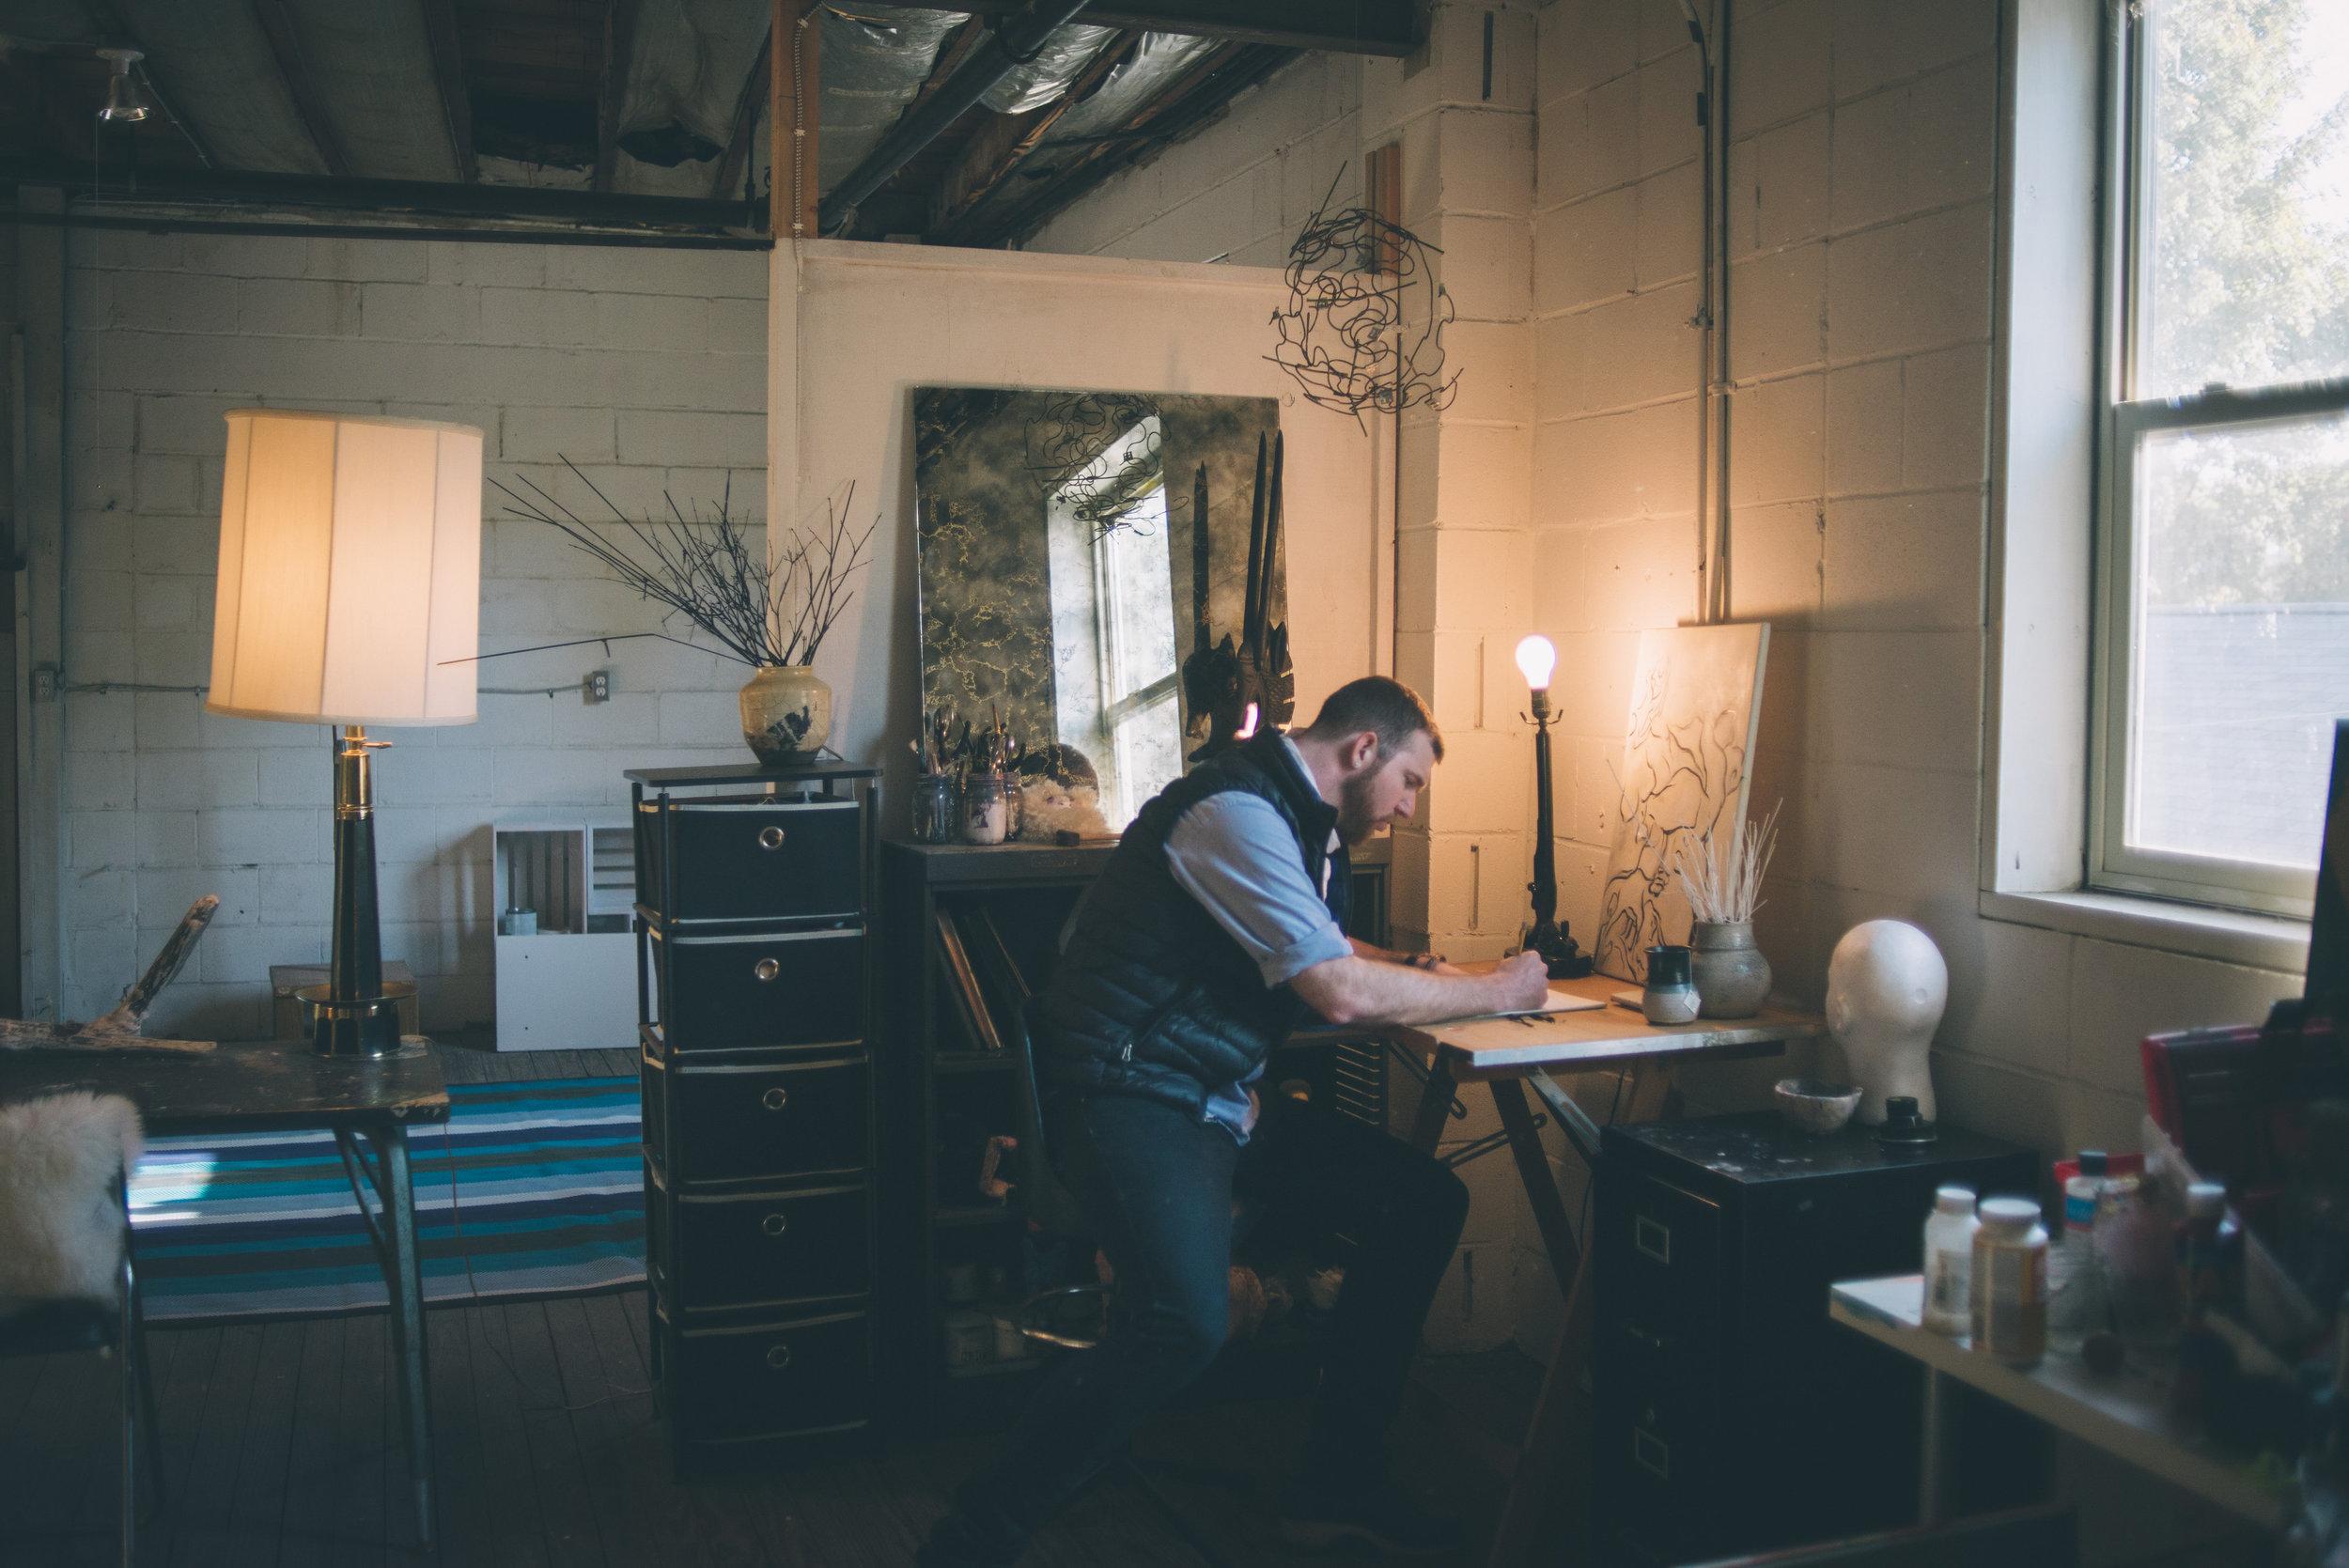 Michael John Braaksma in his studio. Photo by Sarah Katherine Davis for LVA.